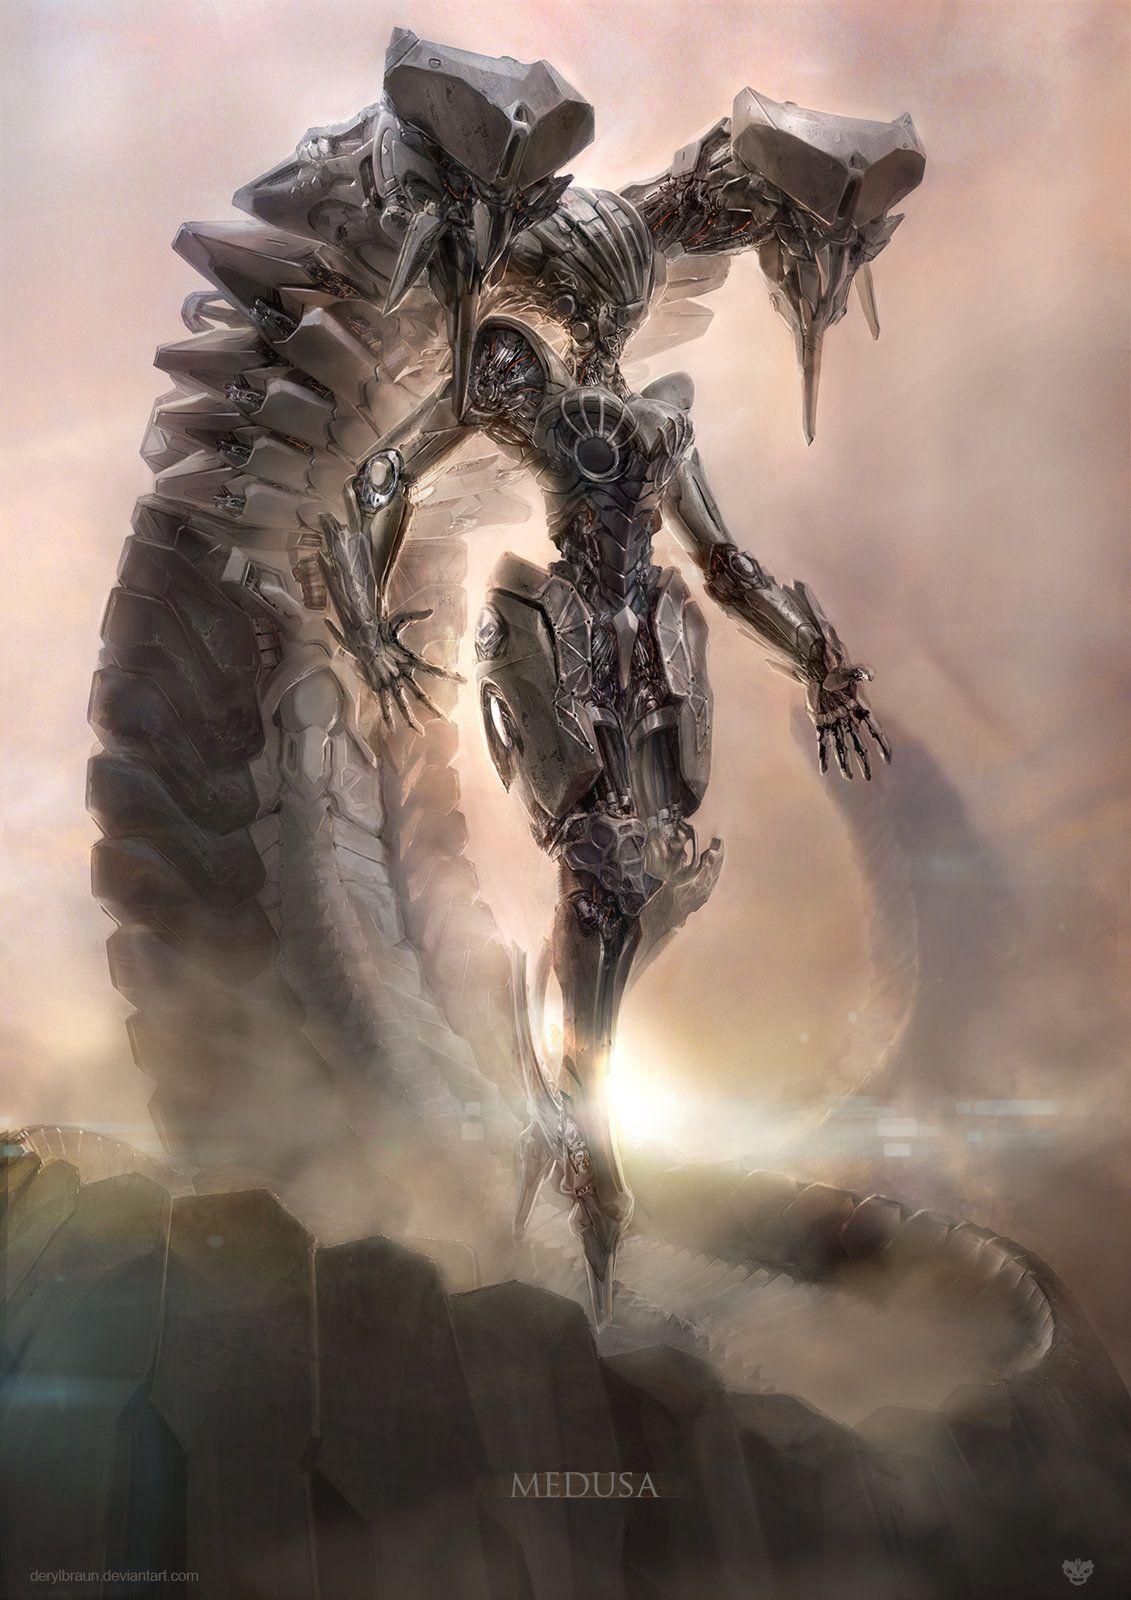 Medusa, Deryl Braun on ArtStation at https://www.artstation.com/artwork/medusa-a9f3df9f-eddc-4703-aac2-027ddc914b09